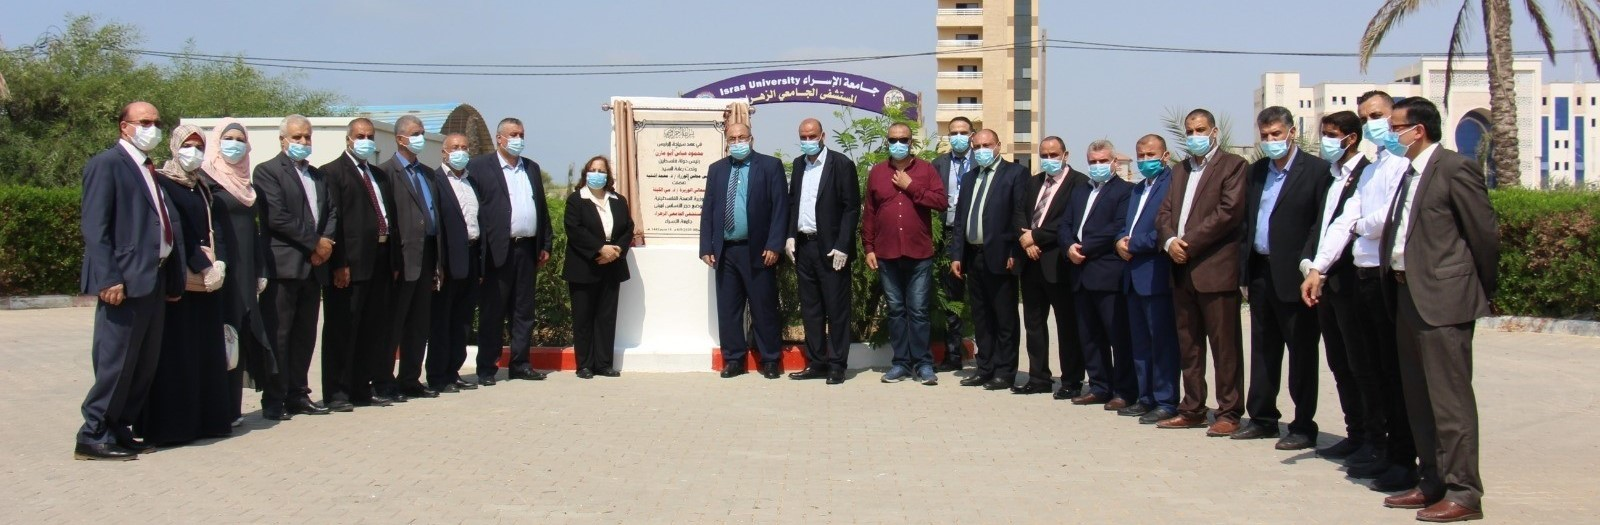 Dr. Mai AlKaila,  Minister of Health, Laid the Foundation Stone of Israa University Hospital